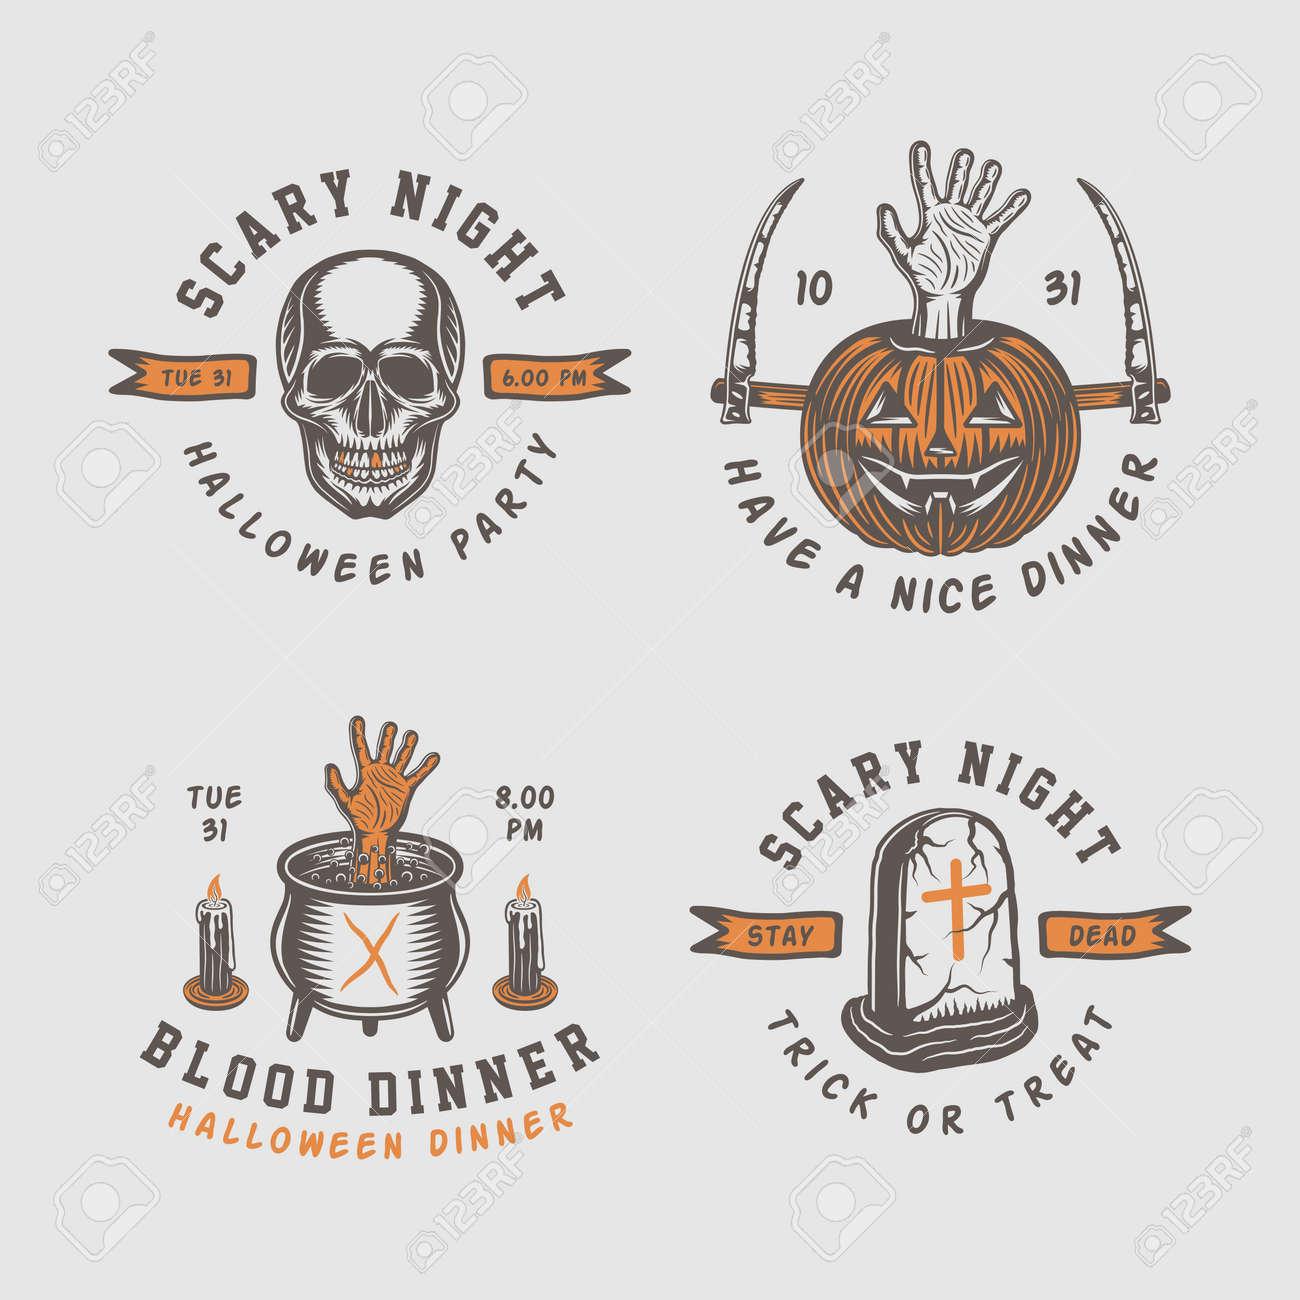 Retro Vintage Halloween Clip Art.Vintage Retro Halloween Logos Emblems Badges Labels Marks